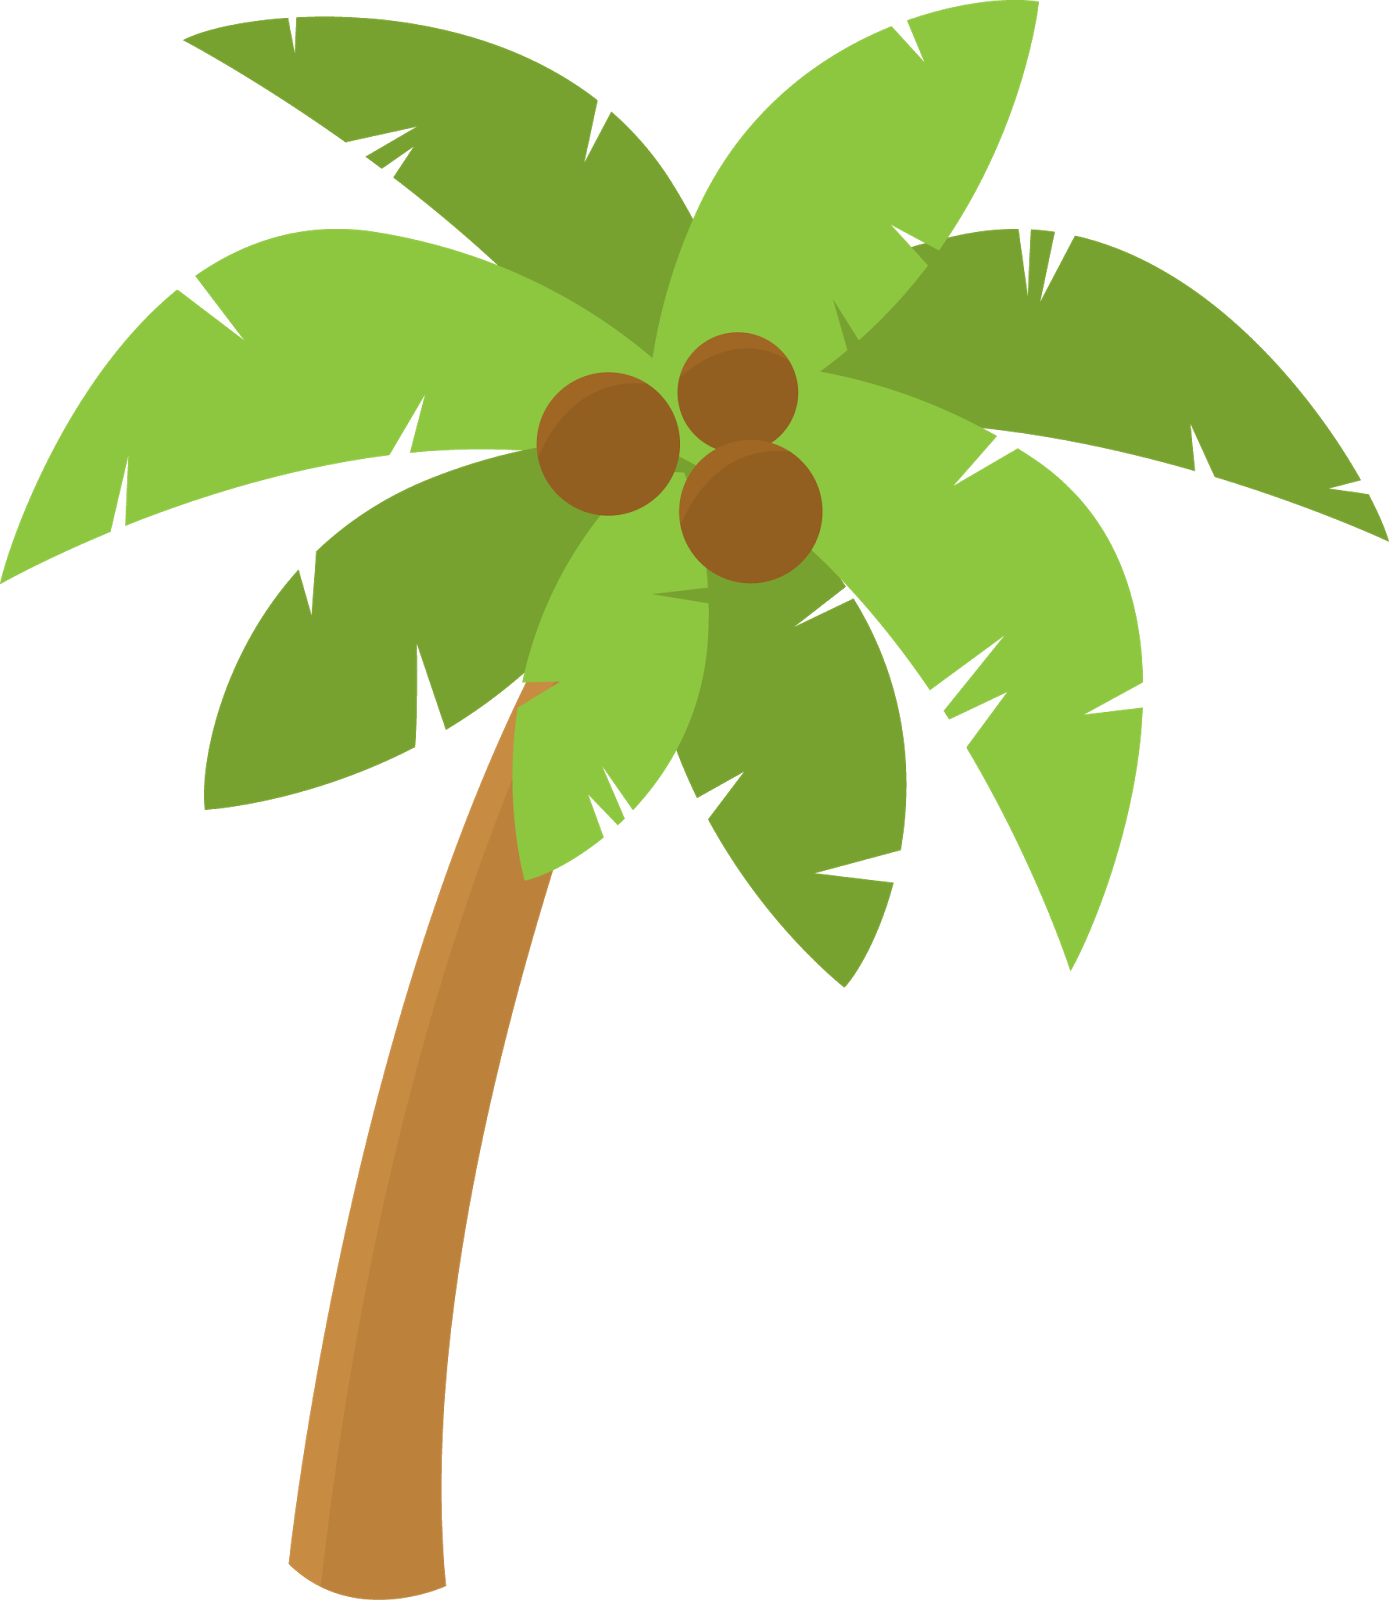 Luau kids png dibujos. Hawaiian clipart palm tree